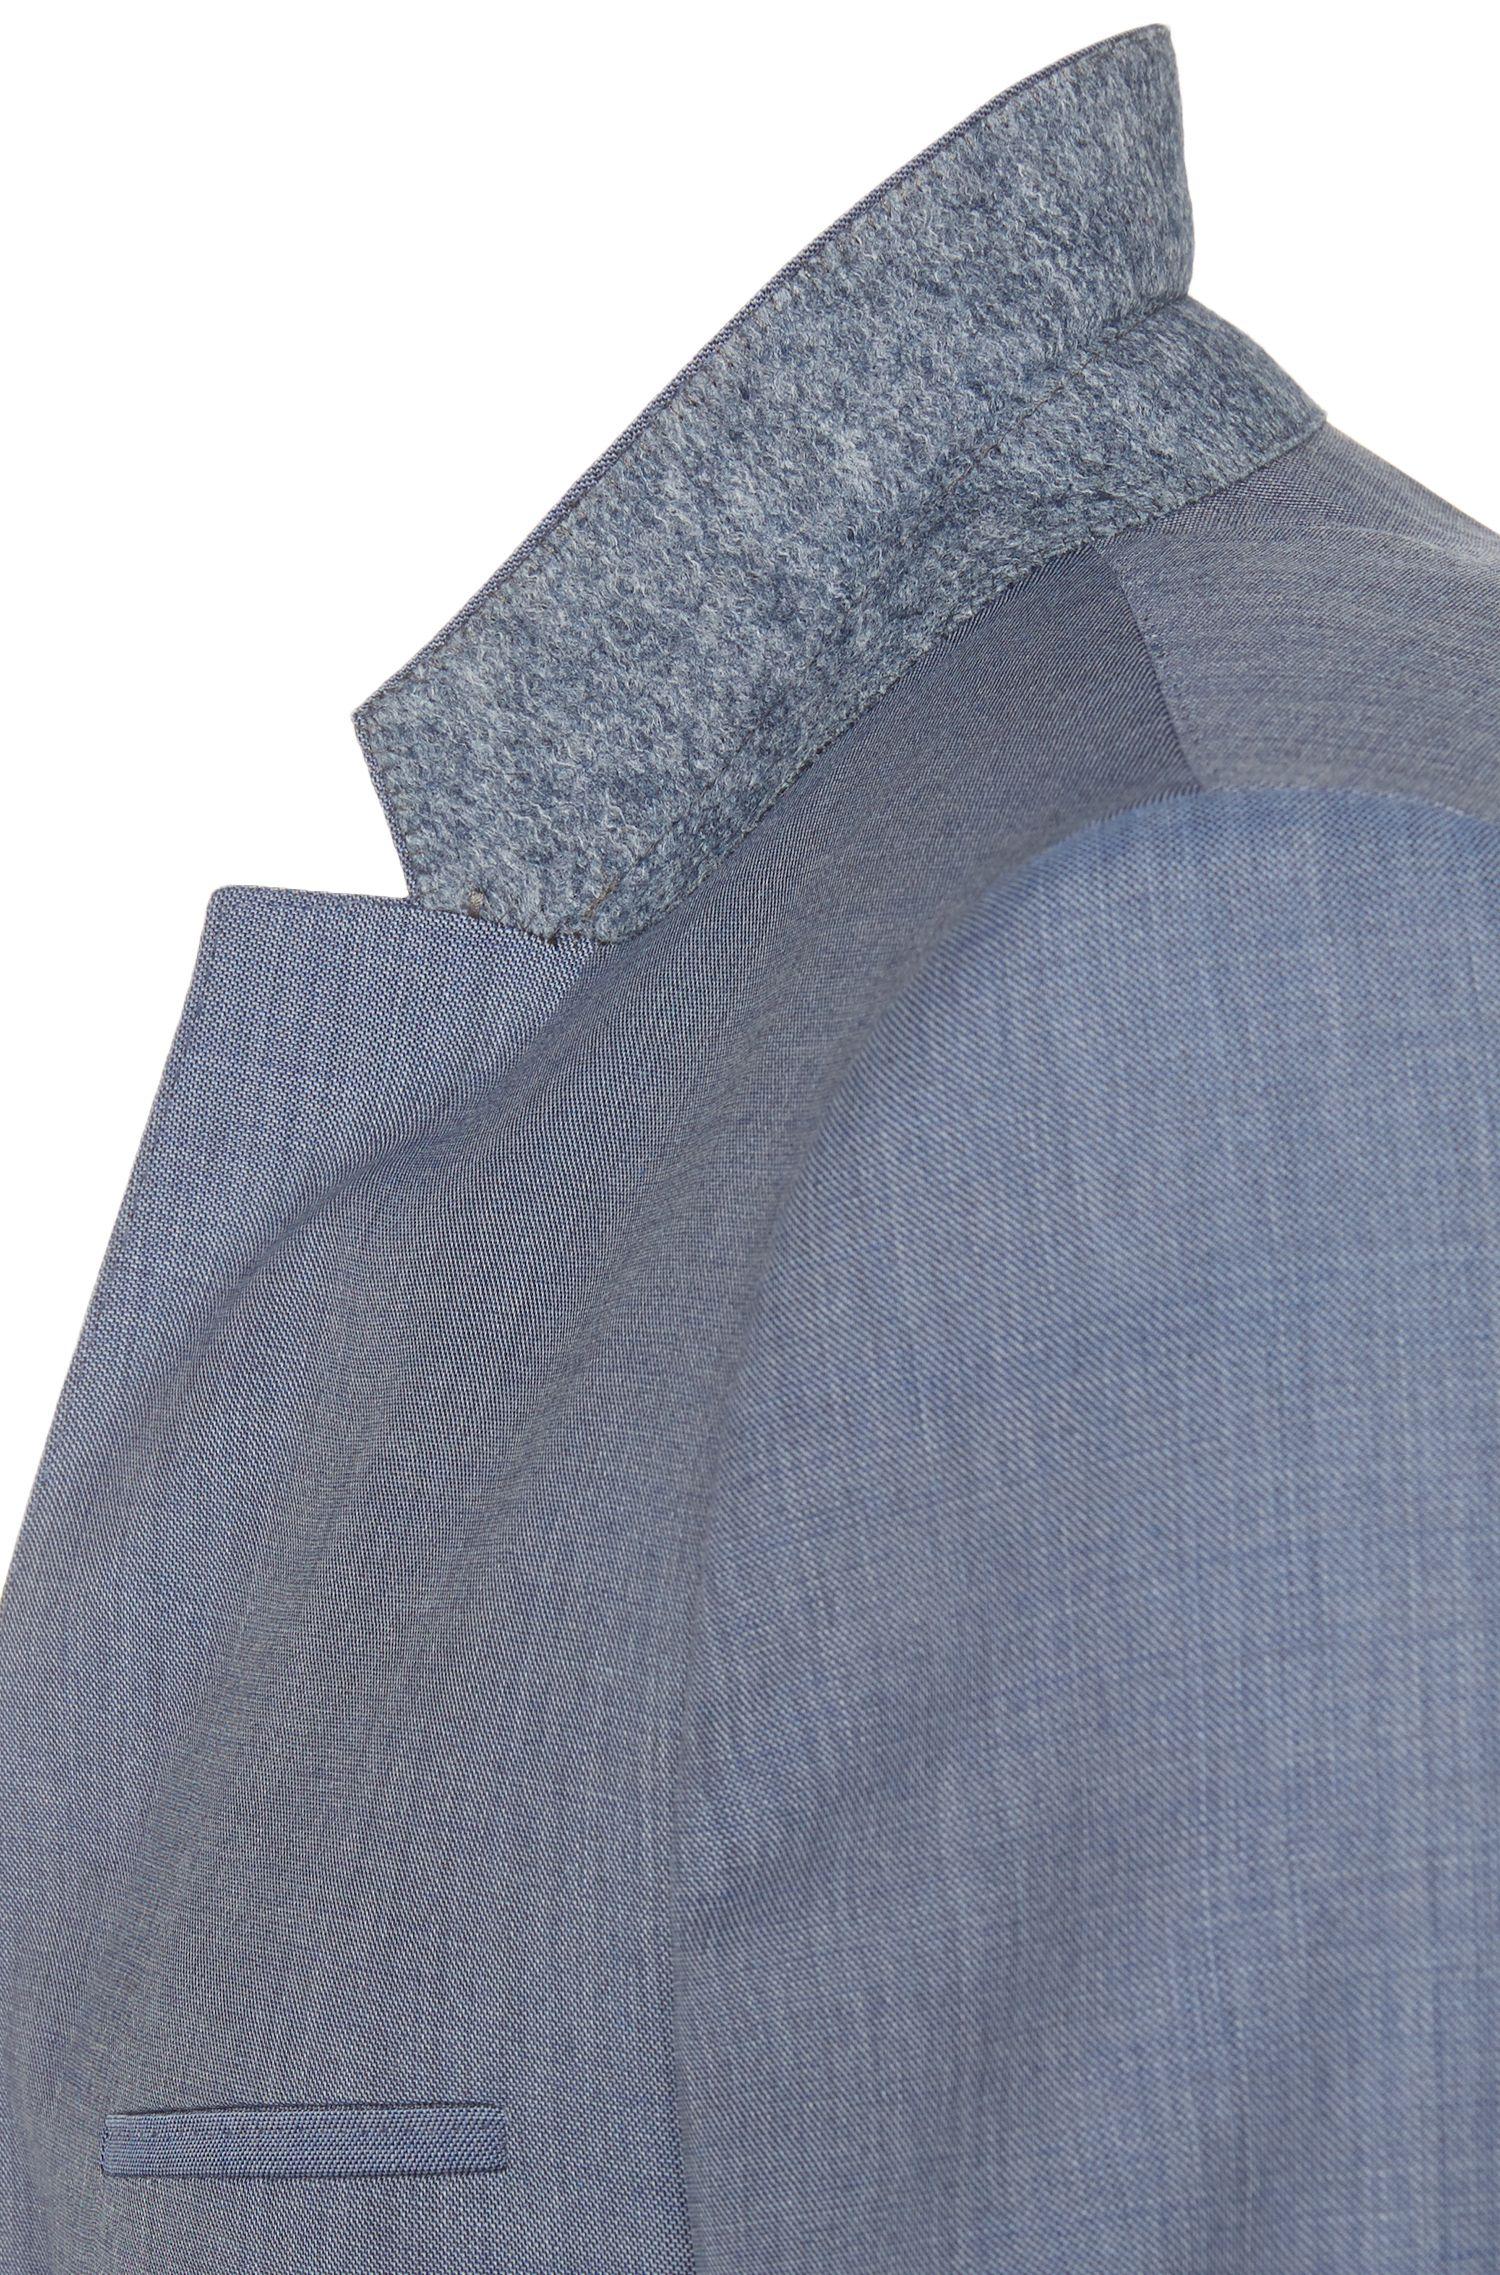 Heather Virgin Wool Suit, Slim Fit   Arti/Helion, Turquoise